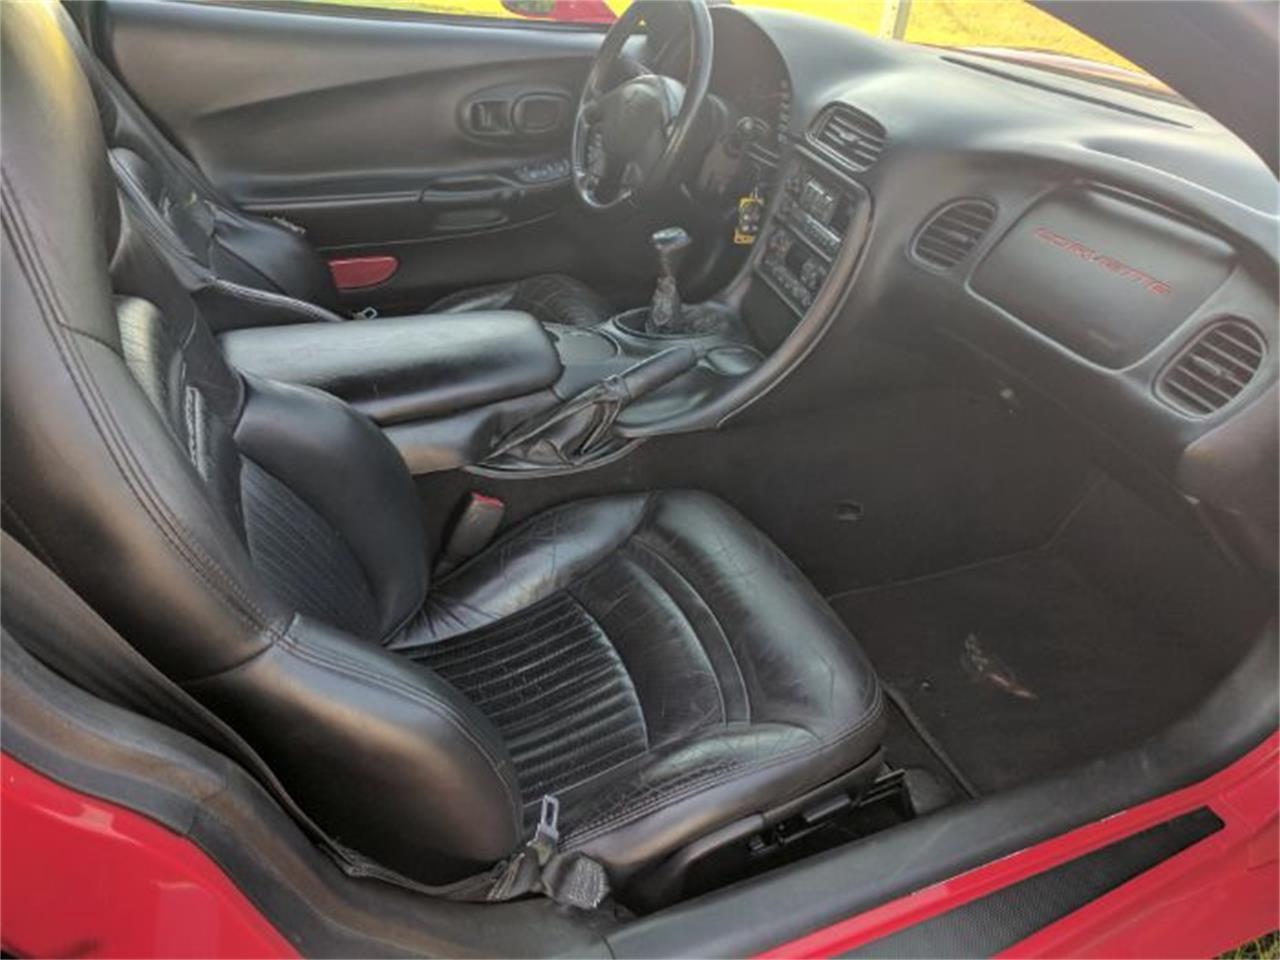 Large Picture of 2000 Chevrolet Corvette located in Michigan - $13,900.00 - L7I1